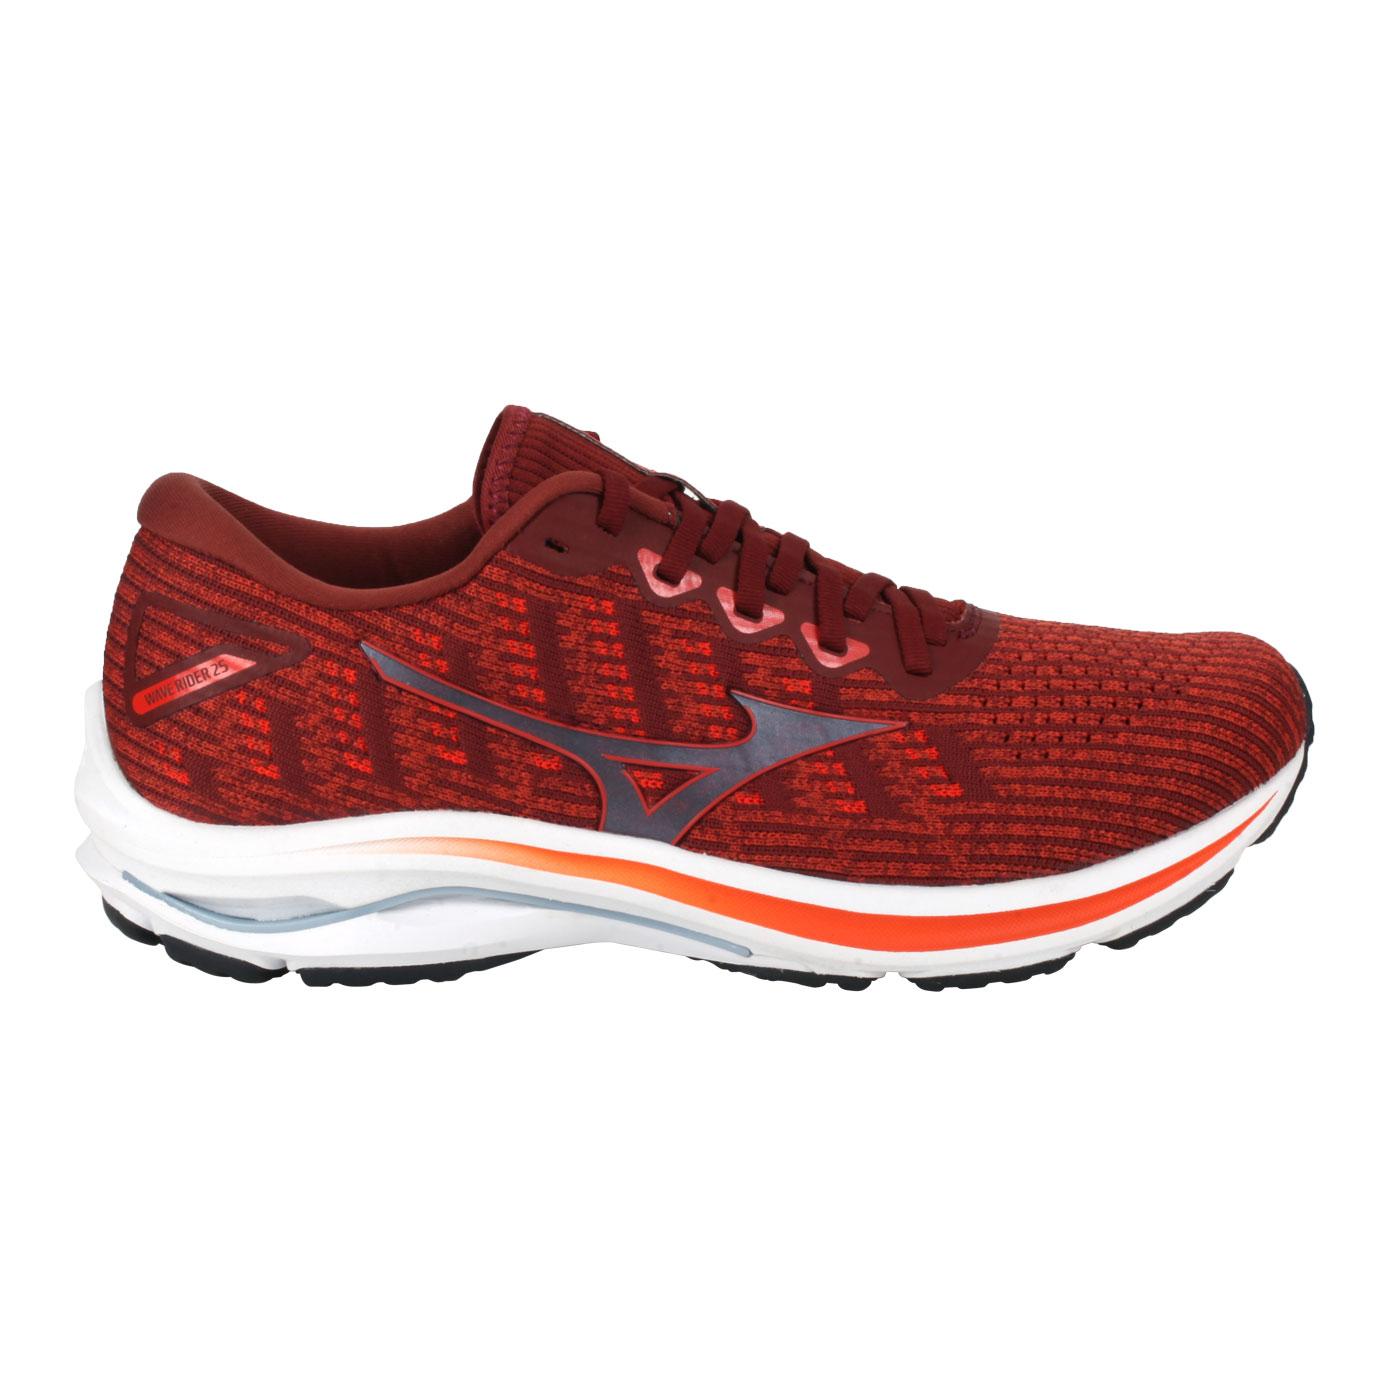 MIZUNO 特定-男款慢跑鞋-4E  @WAVE RIDER 25 WAVEKNIT SW@J1GC217677 - 磚瓦紅橘